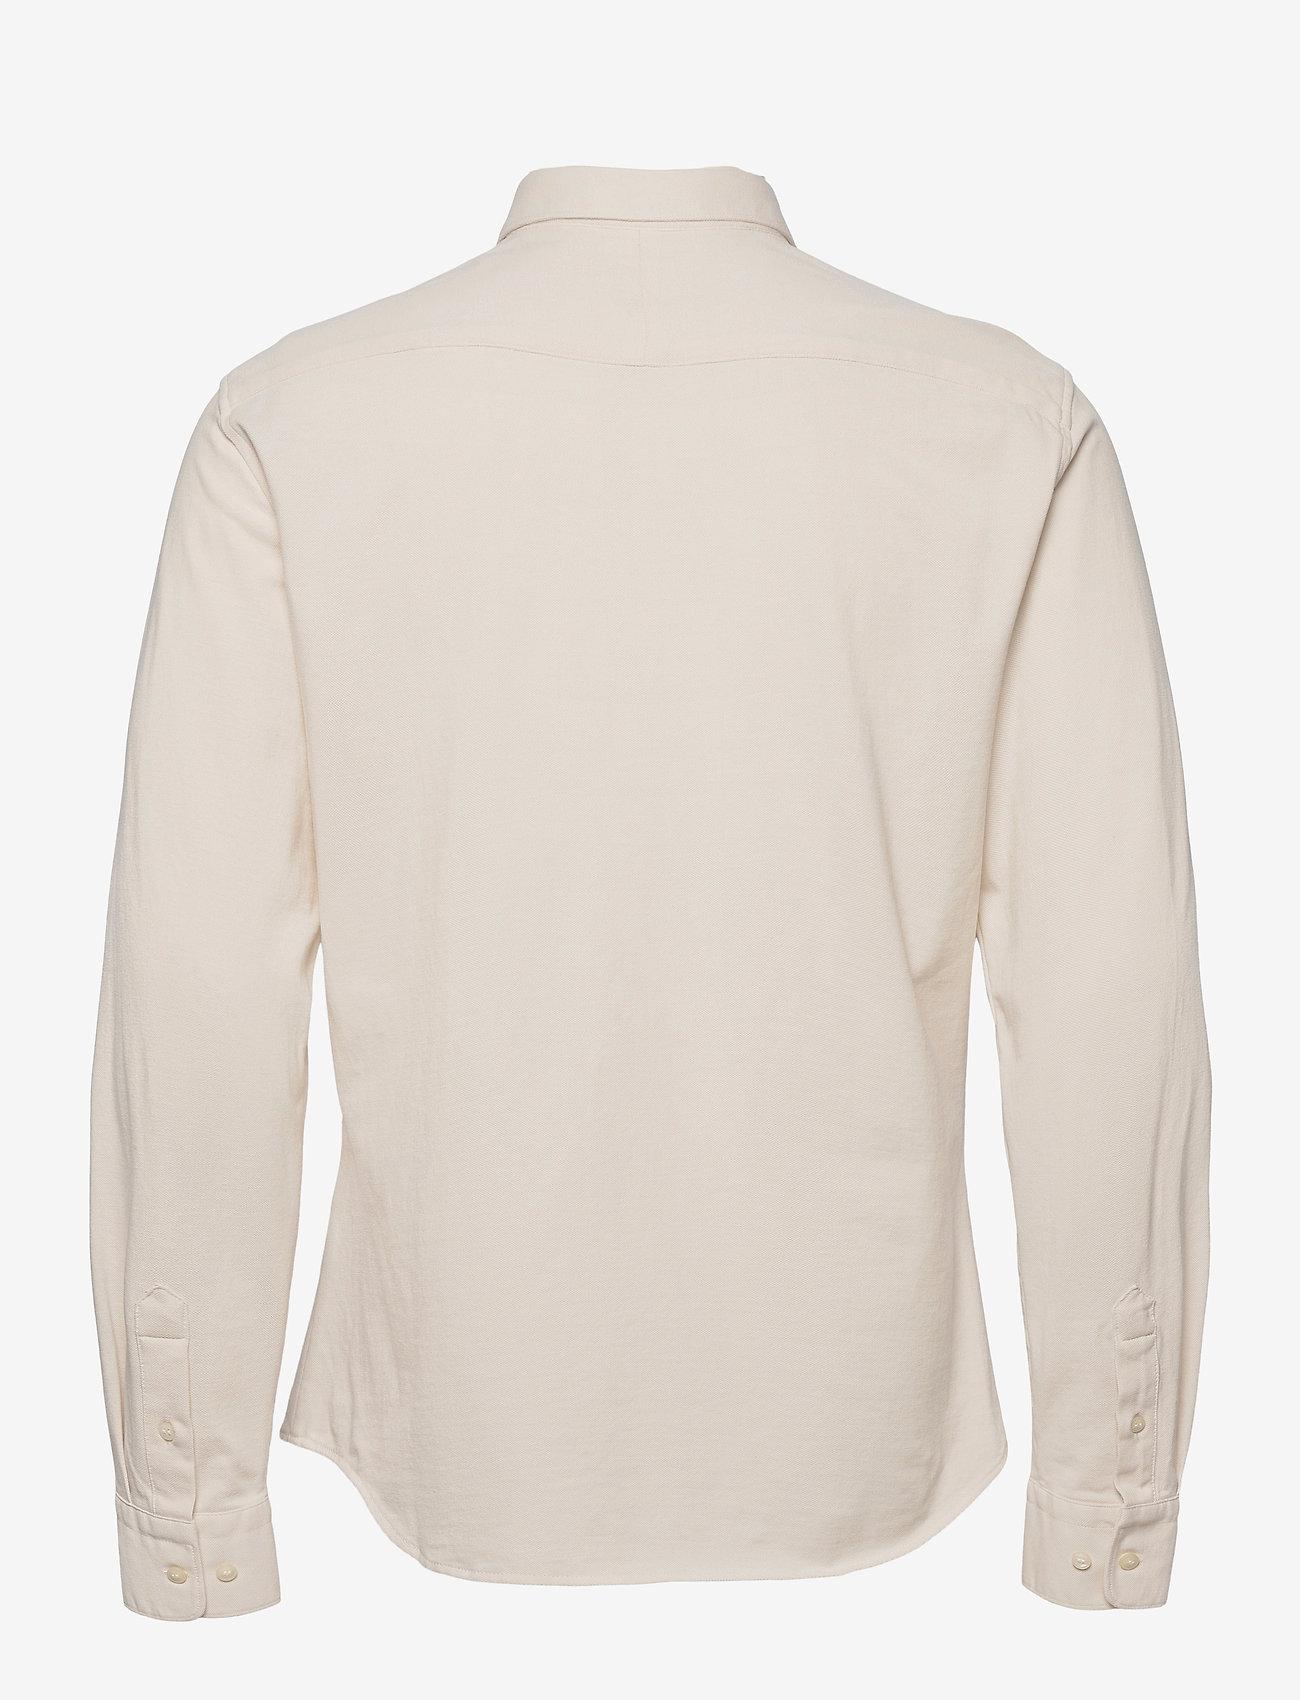 Tiger of Sweden - FENALD - basic skjorter - tinted white - 1